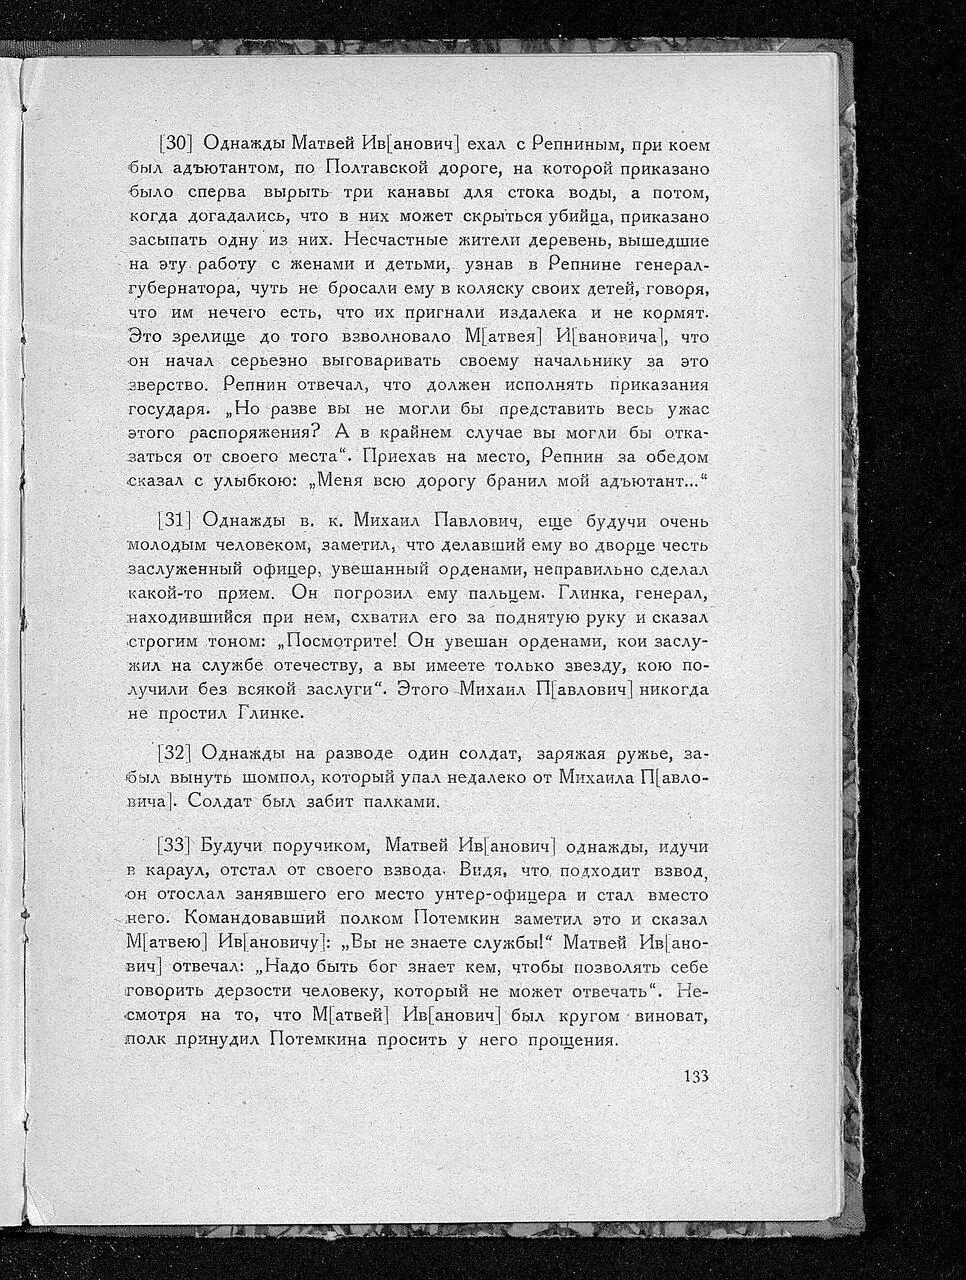 https://img-fotki.yandex.ru/get/931298/199368979.a2/0_21437e_bc21c691_XXXL.jpg